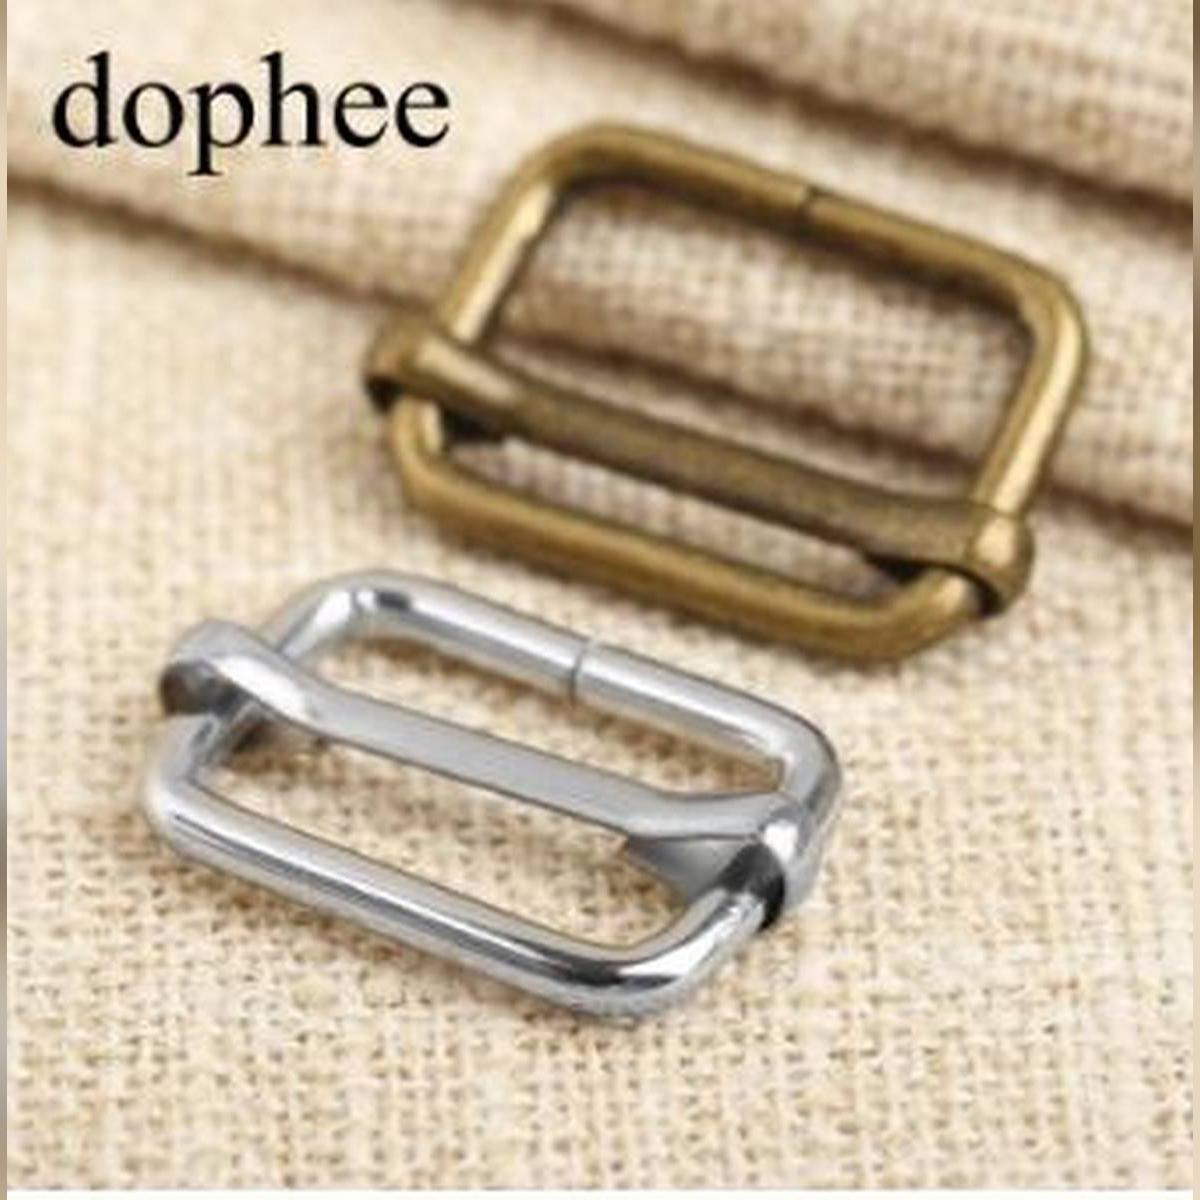 20pcs Metal adjustable square ring buckles garment belt DIY Needlework Luggage Sewing handmade Bag purse